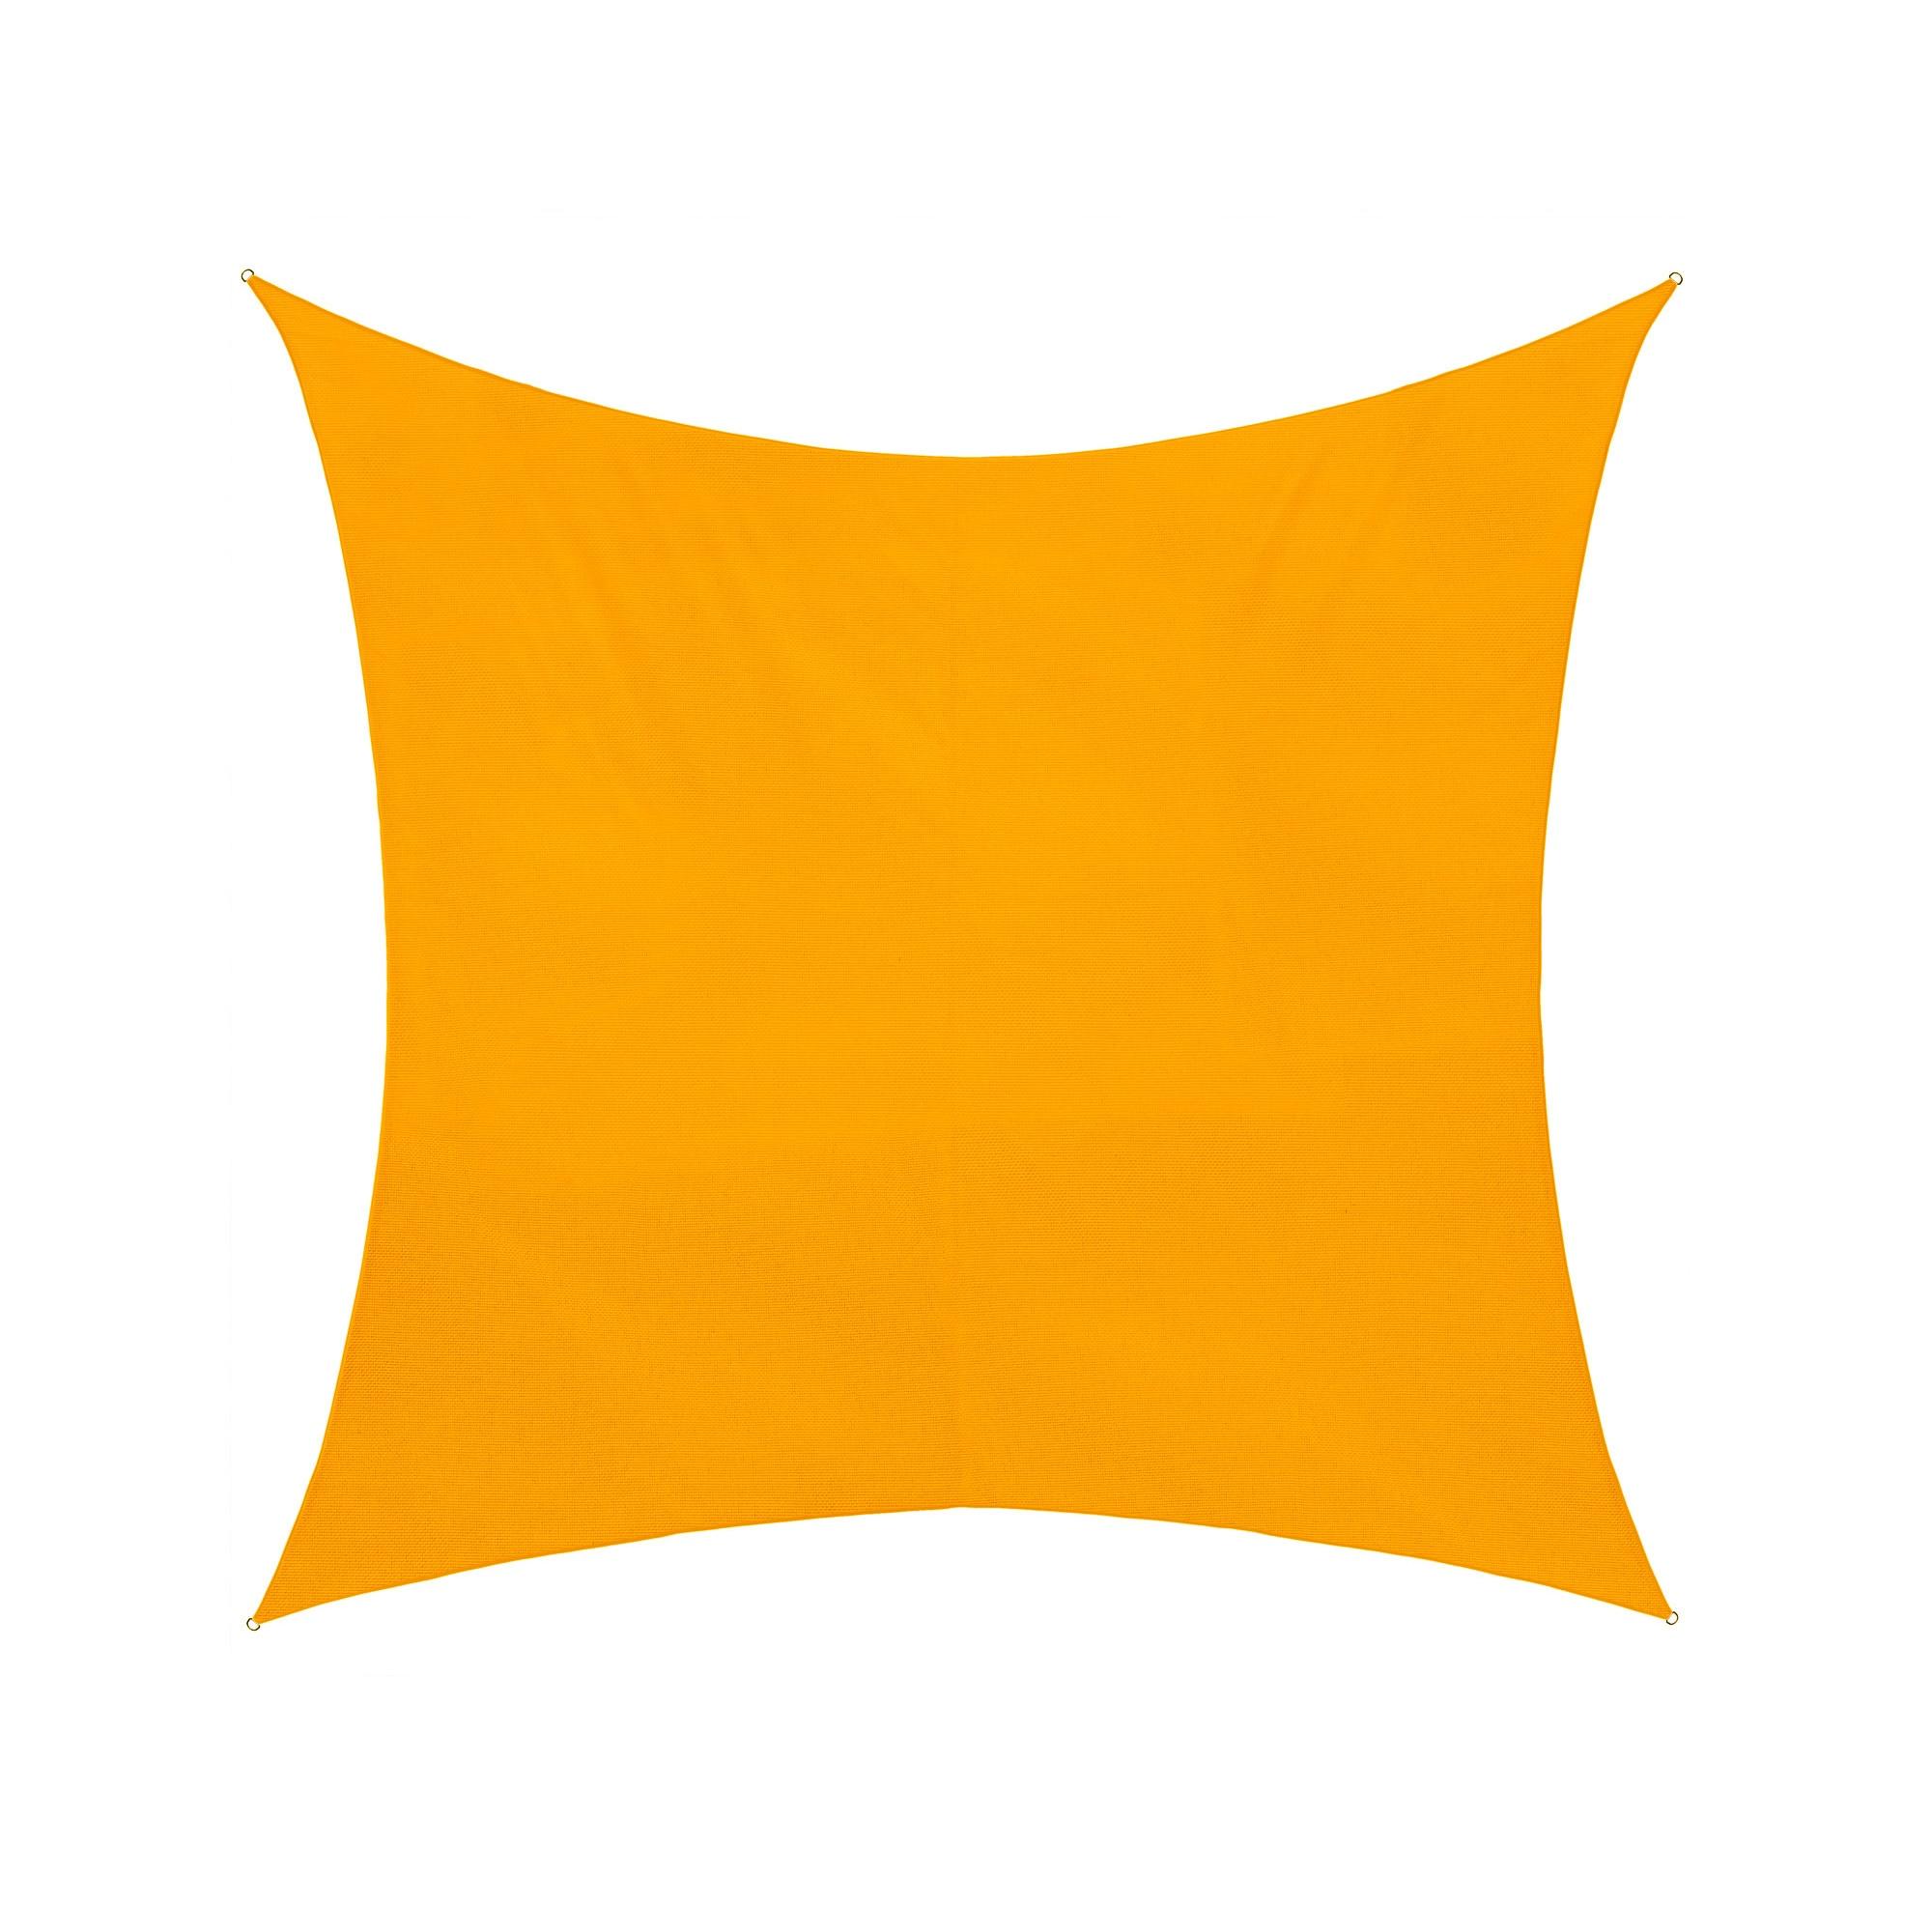 sonnensegel sonnenschutzsegel quadrat viereck rechteck. Black Bedroom Furniture Sets. Home Design Ideas